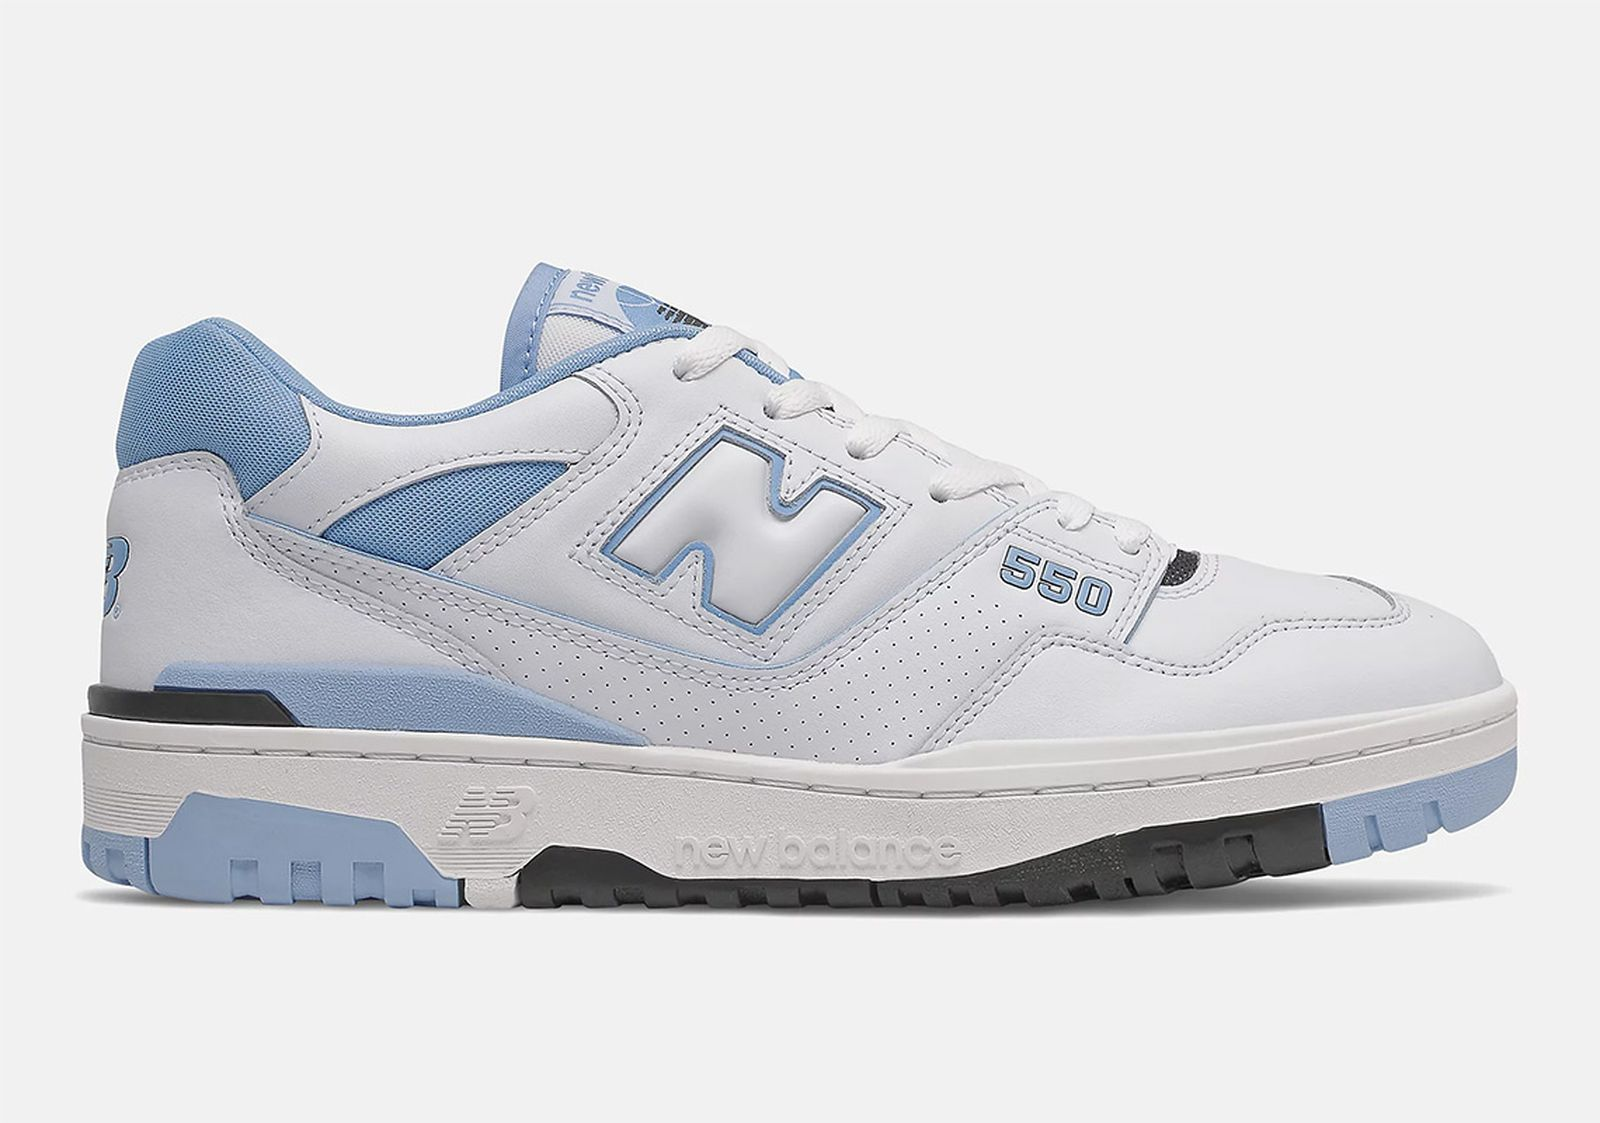 new-balance-550-light-blue-release-date-price-05